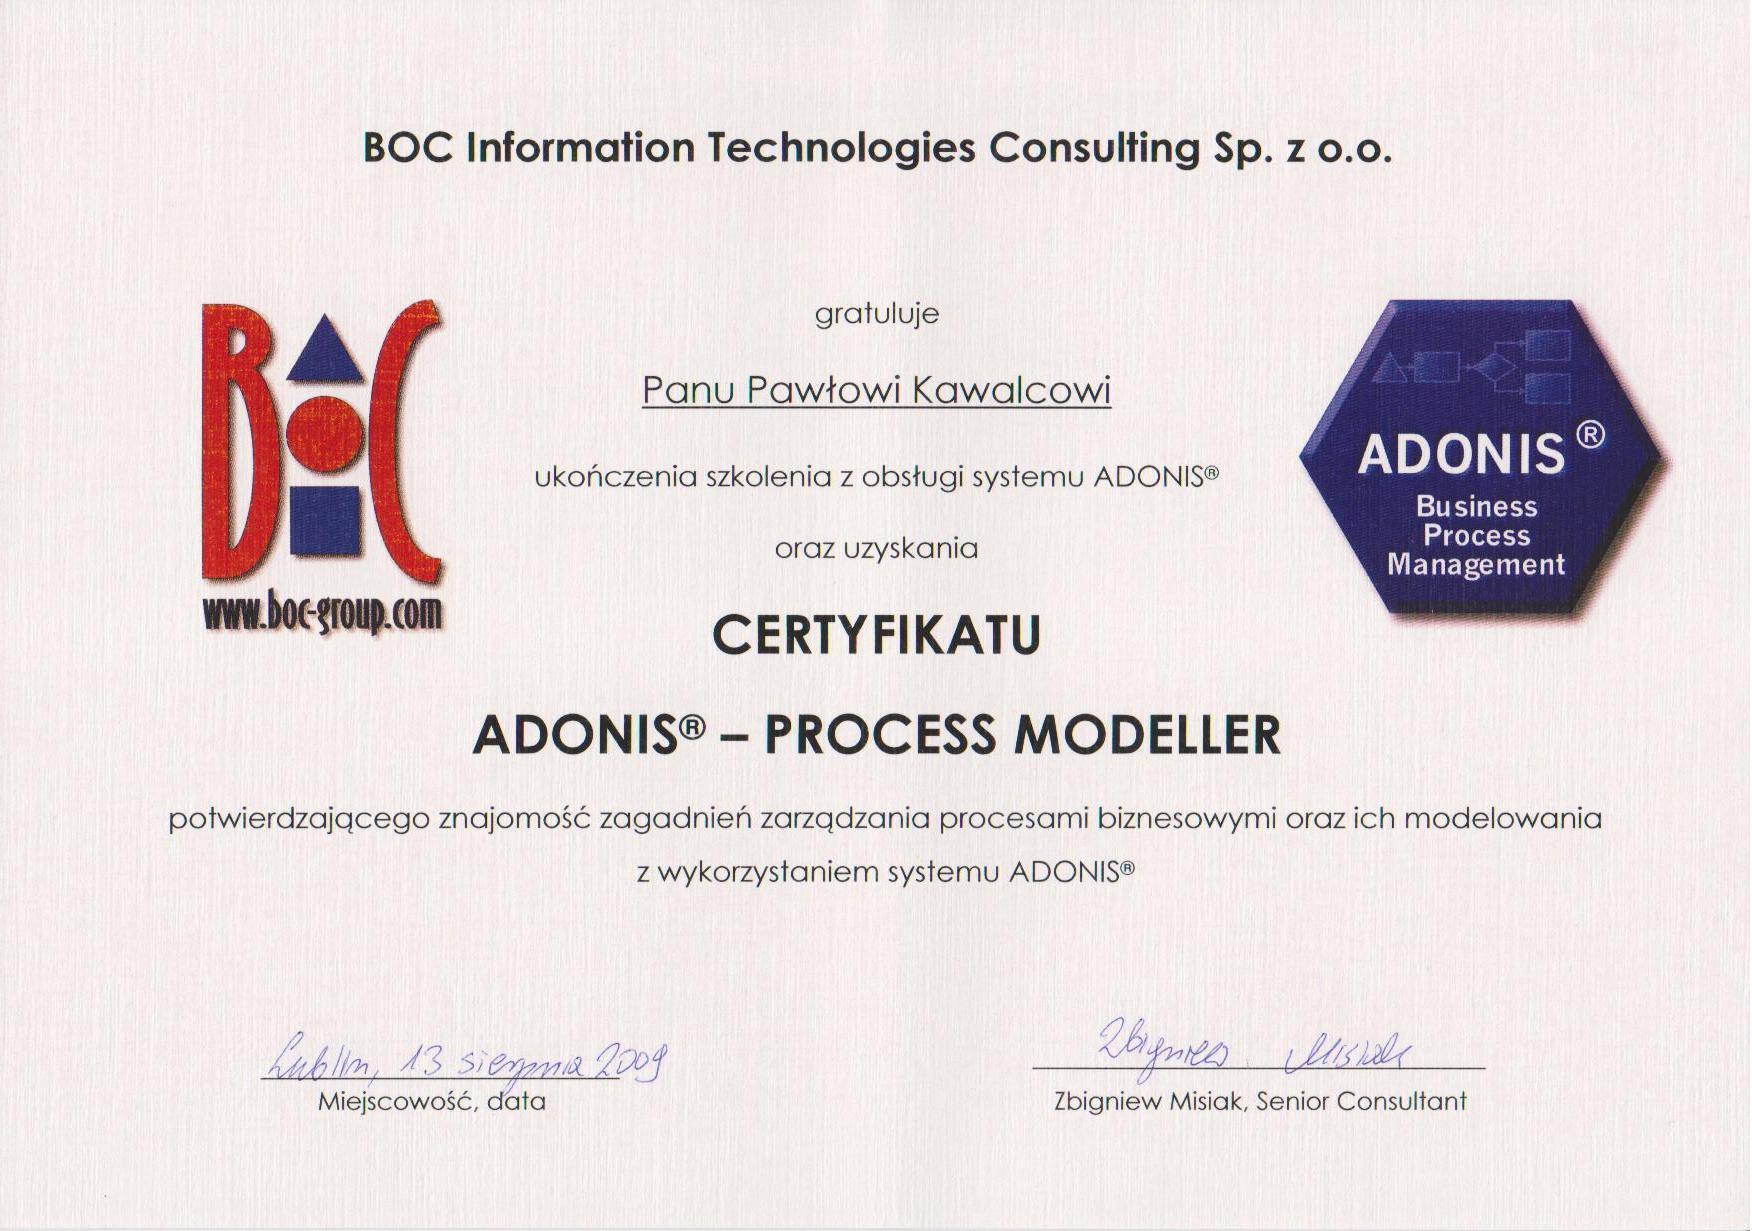 Adonis Process Modeller